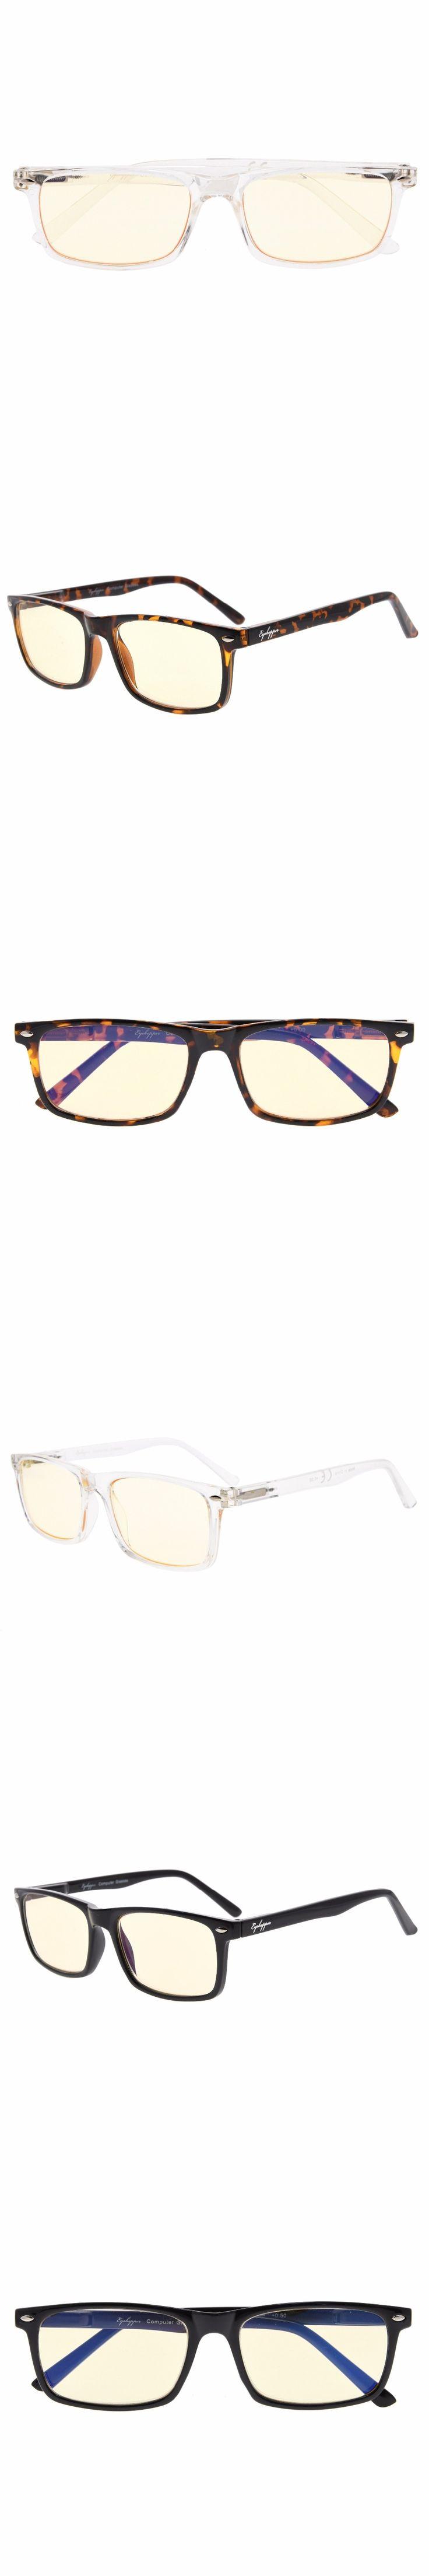 CG899-6 Eyekepper UV Protection, Anti Glare Eyeglasses,Anti Blue Rays, Spring Hinges Computer Reading Glasses Yellow Tinted Lens